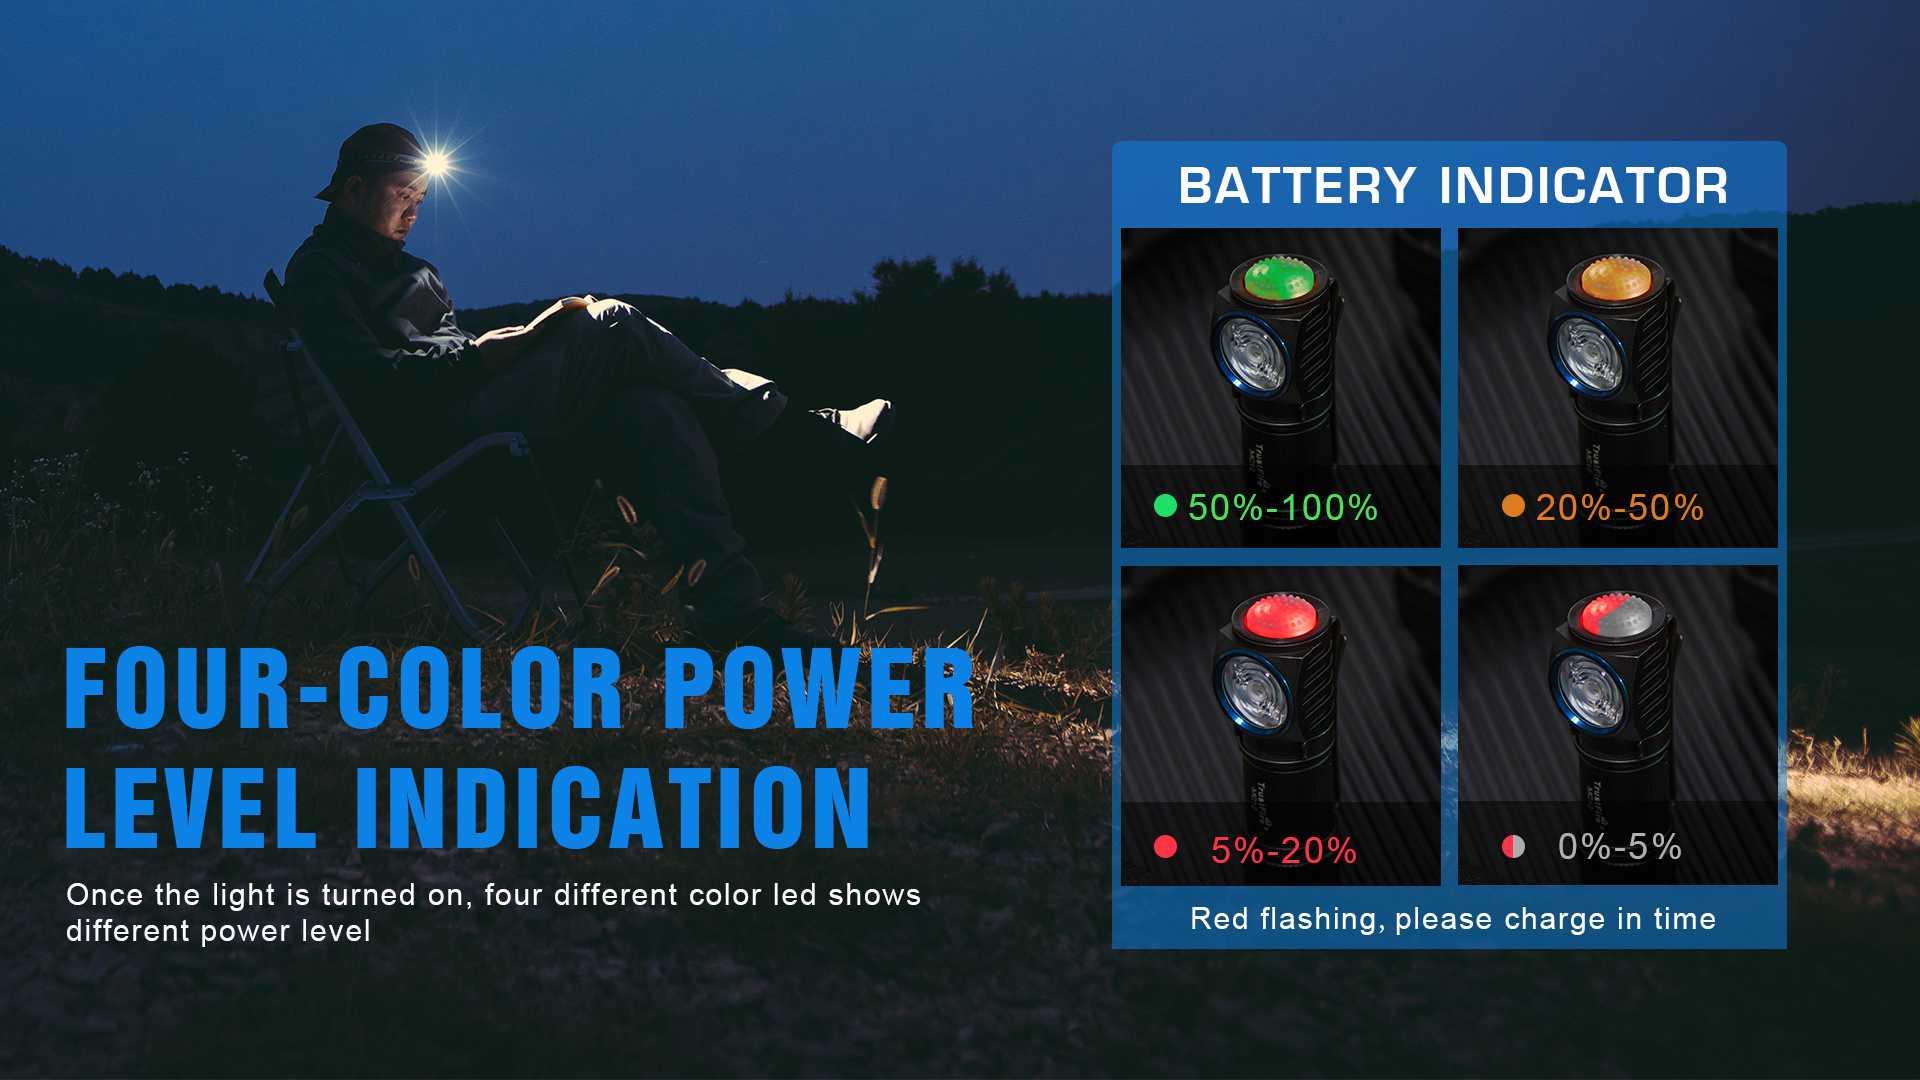 adecuada para acampar al aire libre negro cambiable a faros TrustFire MC12 Linterna LED de 1000 LM Linterna magn/ética de carga r/ápida Mini linterna multifunci/ón equipada con diadema